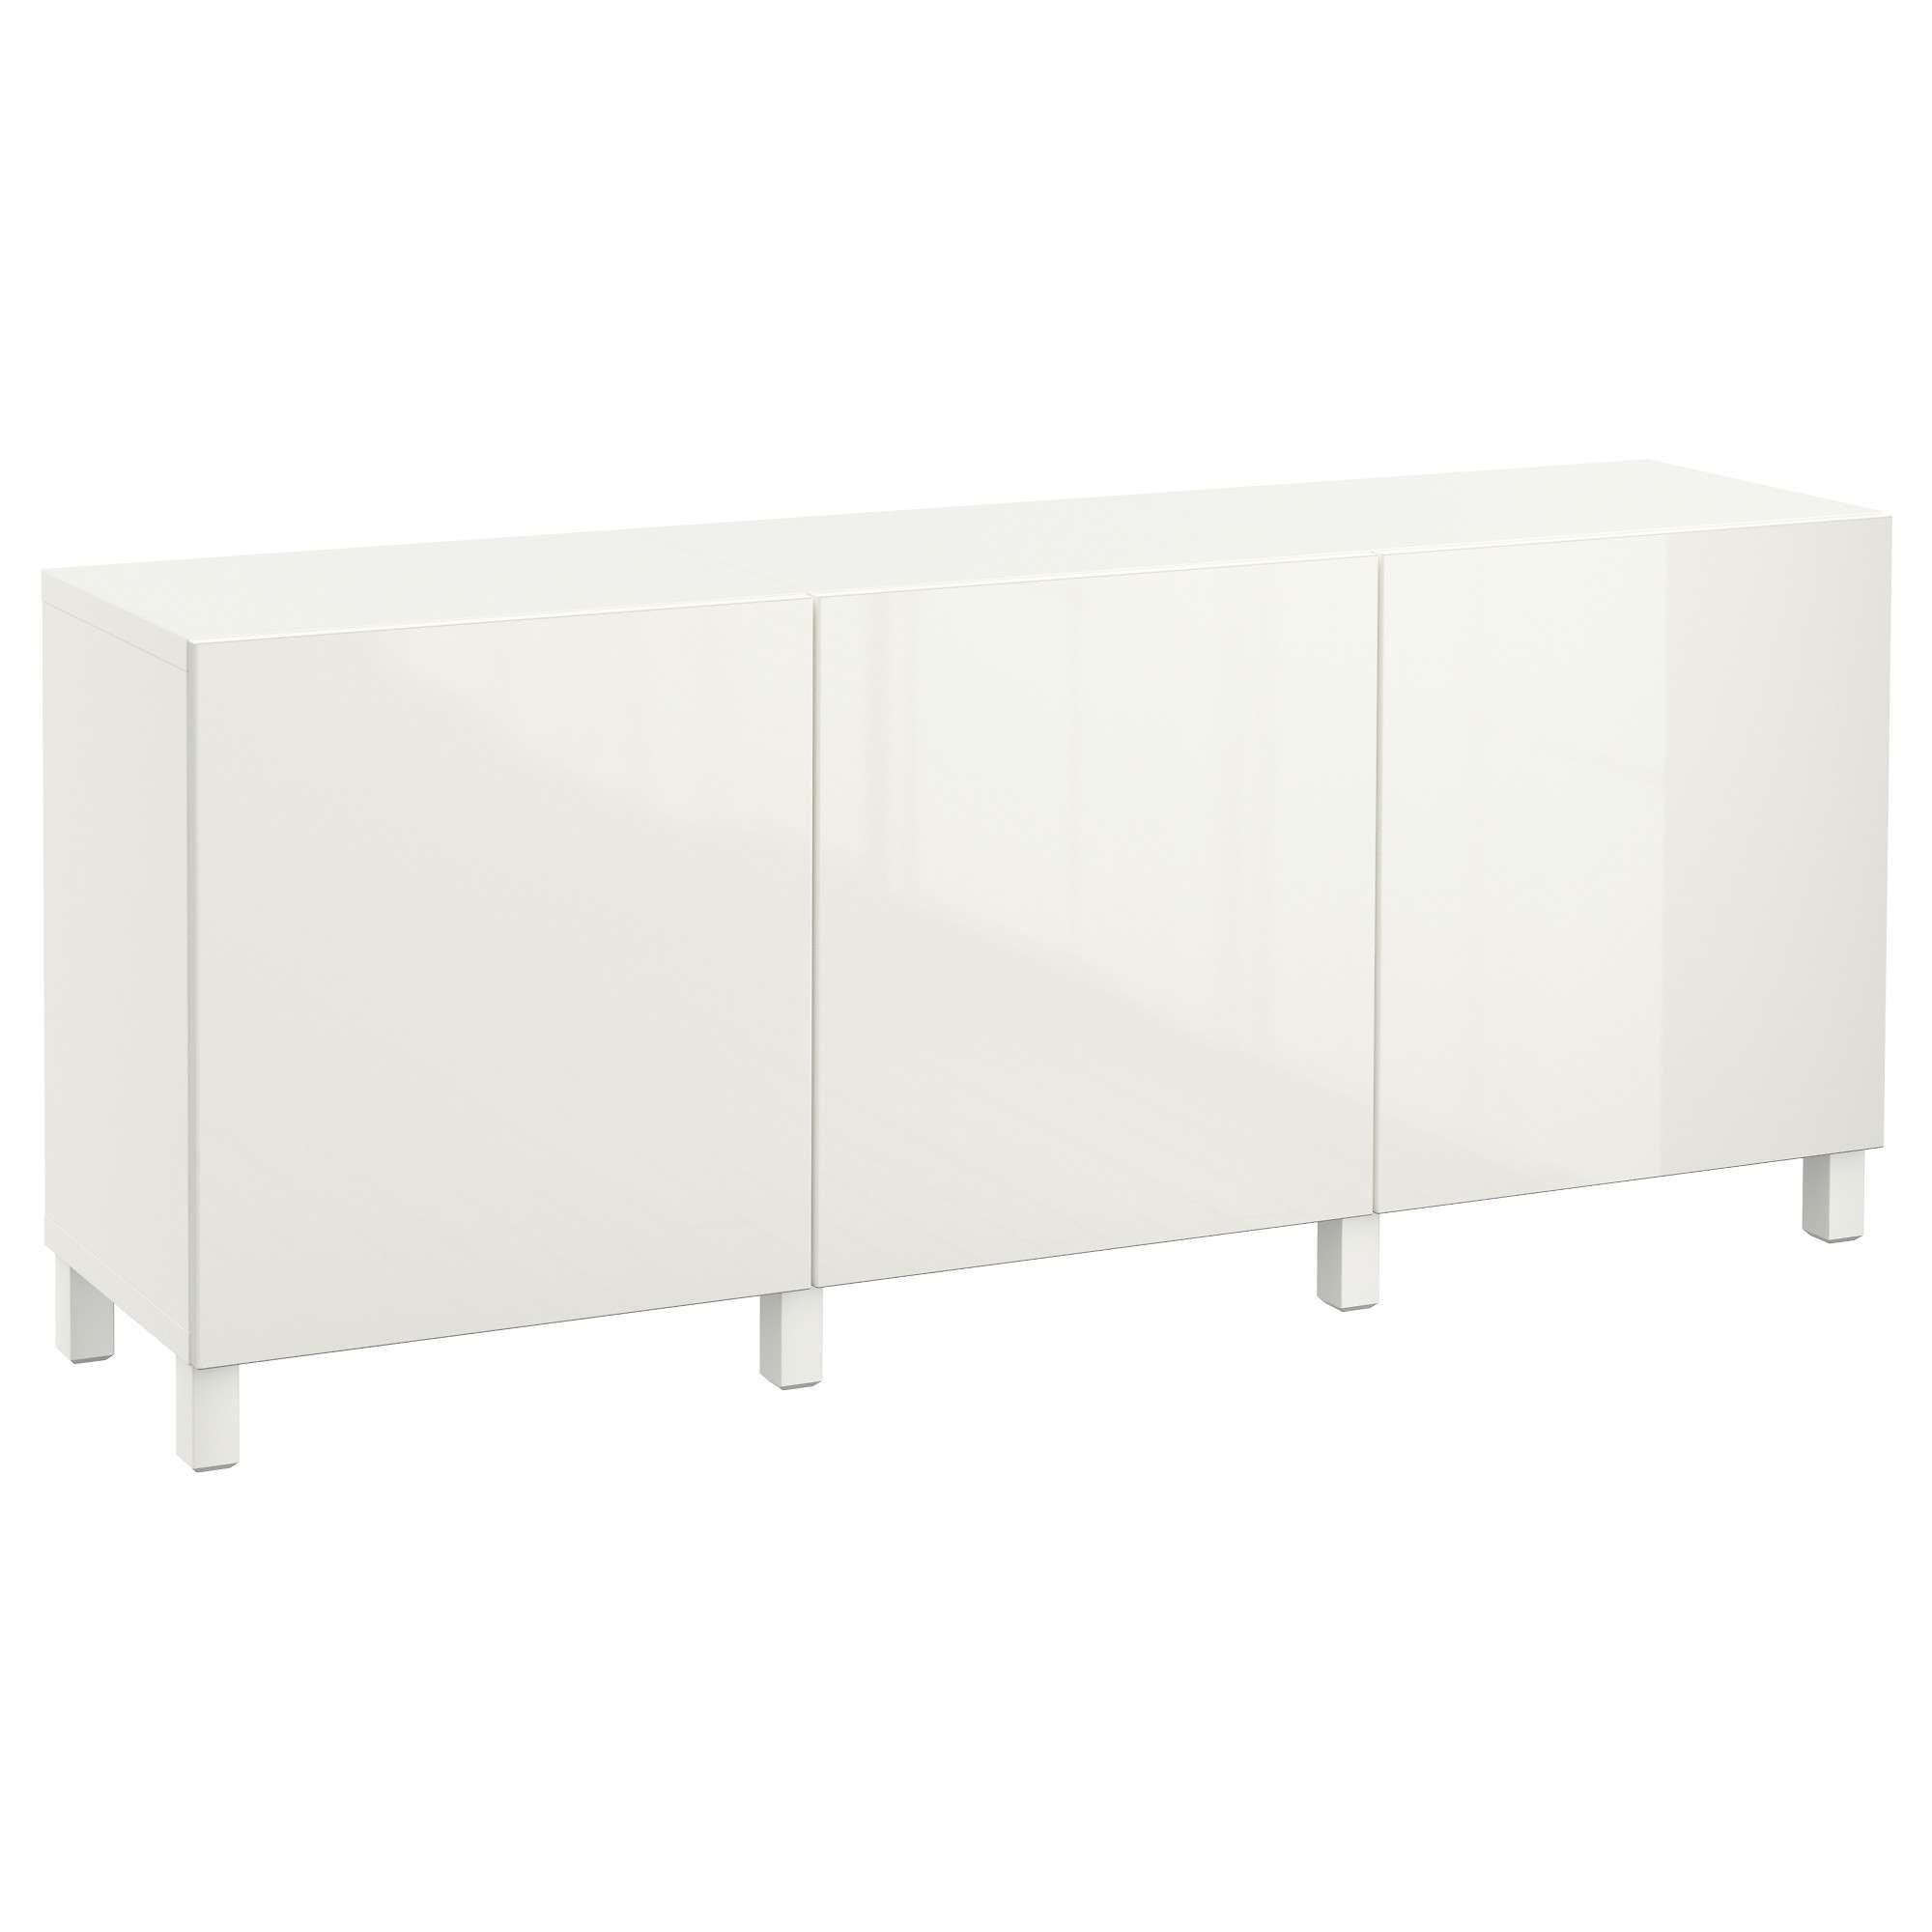 Bestå Storage Combination With Doors – White/selsviken High Gloss Regarding Storage Sideboards (View 18 of 20)